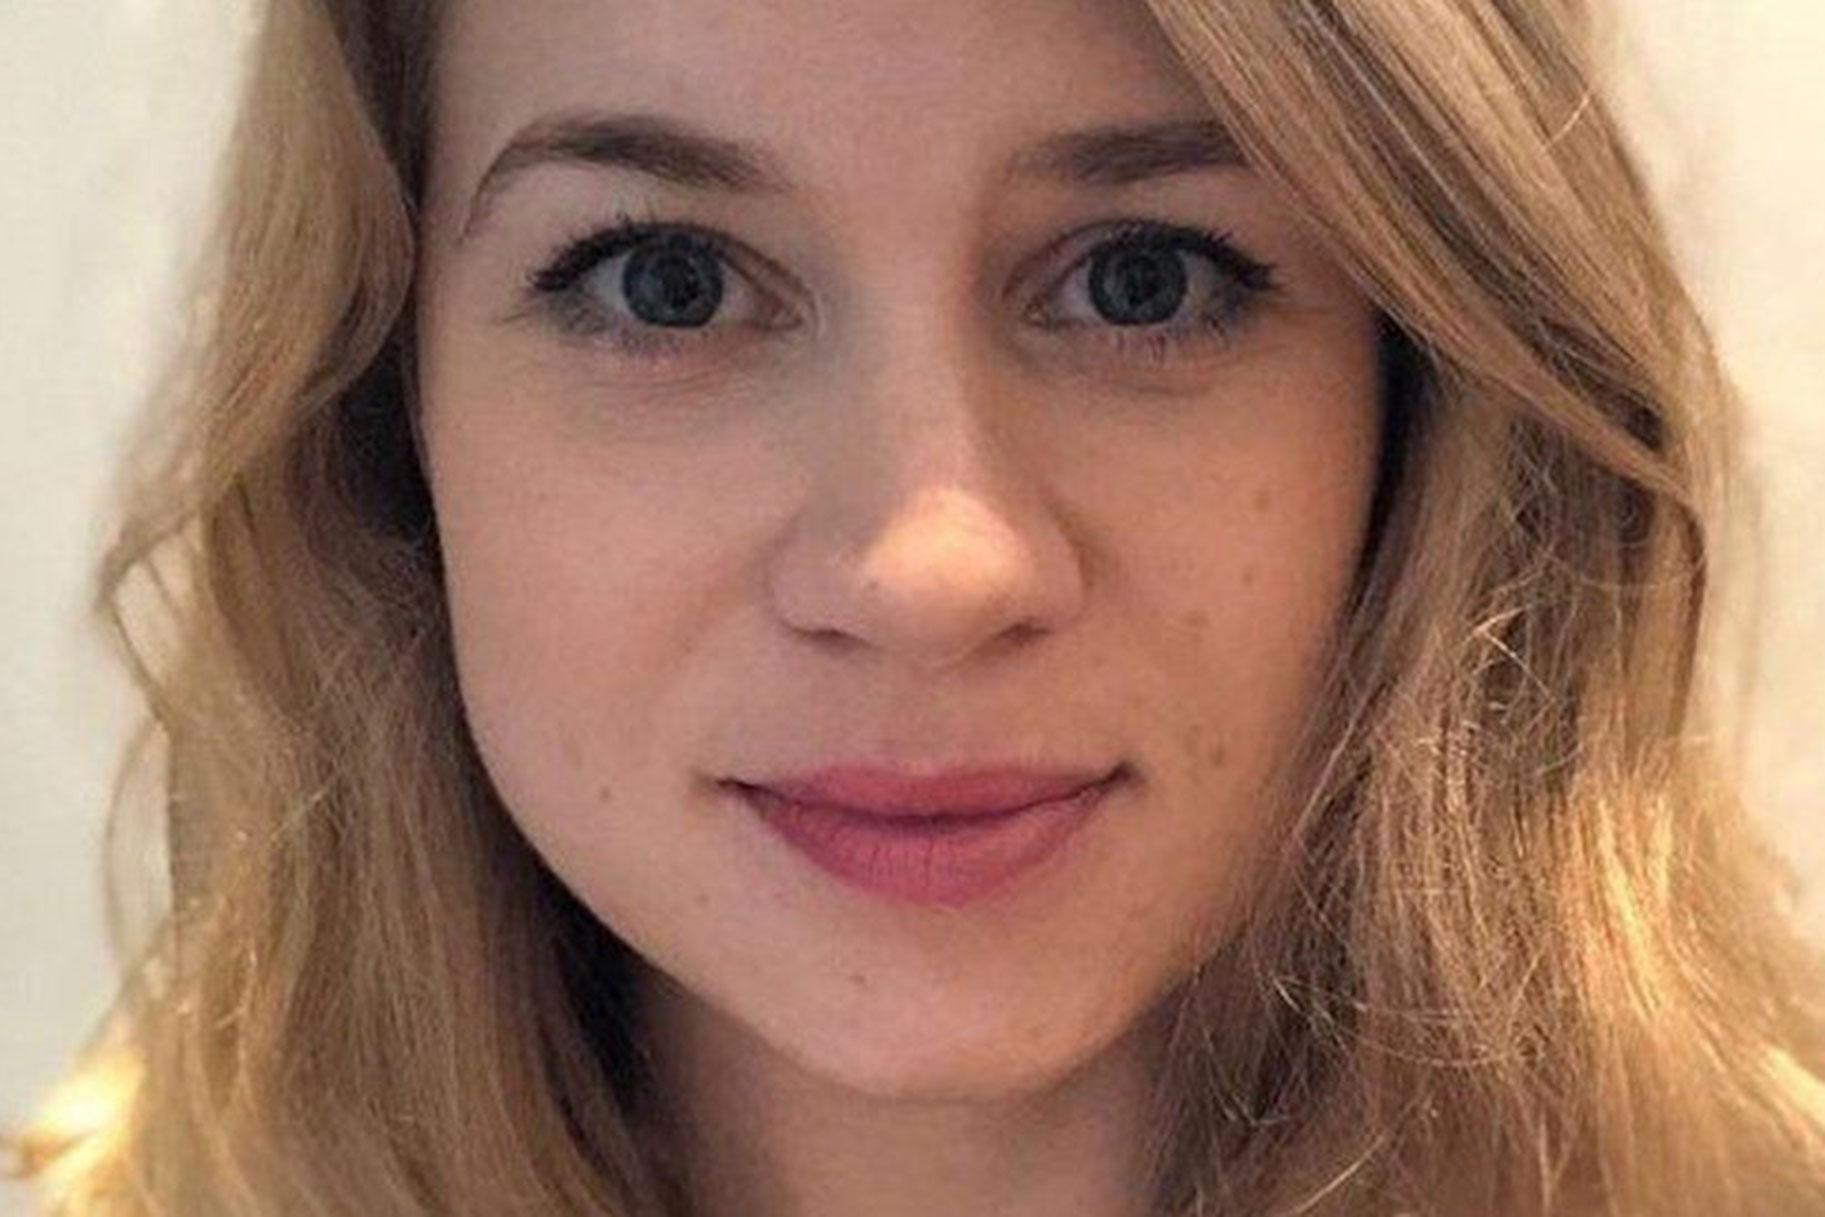 «Shockwaves» δάκρυ σε όλη τη Μεγάλη Βρετανία καθώς ο αστυνομικός συνάντησε τη σύλληψη για απαγωγή, δολοφονία γυναίκας στο Λονδίνο